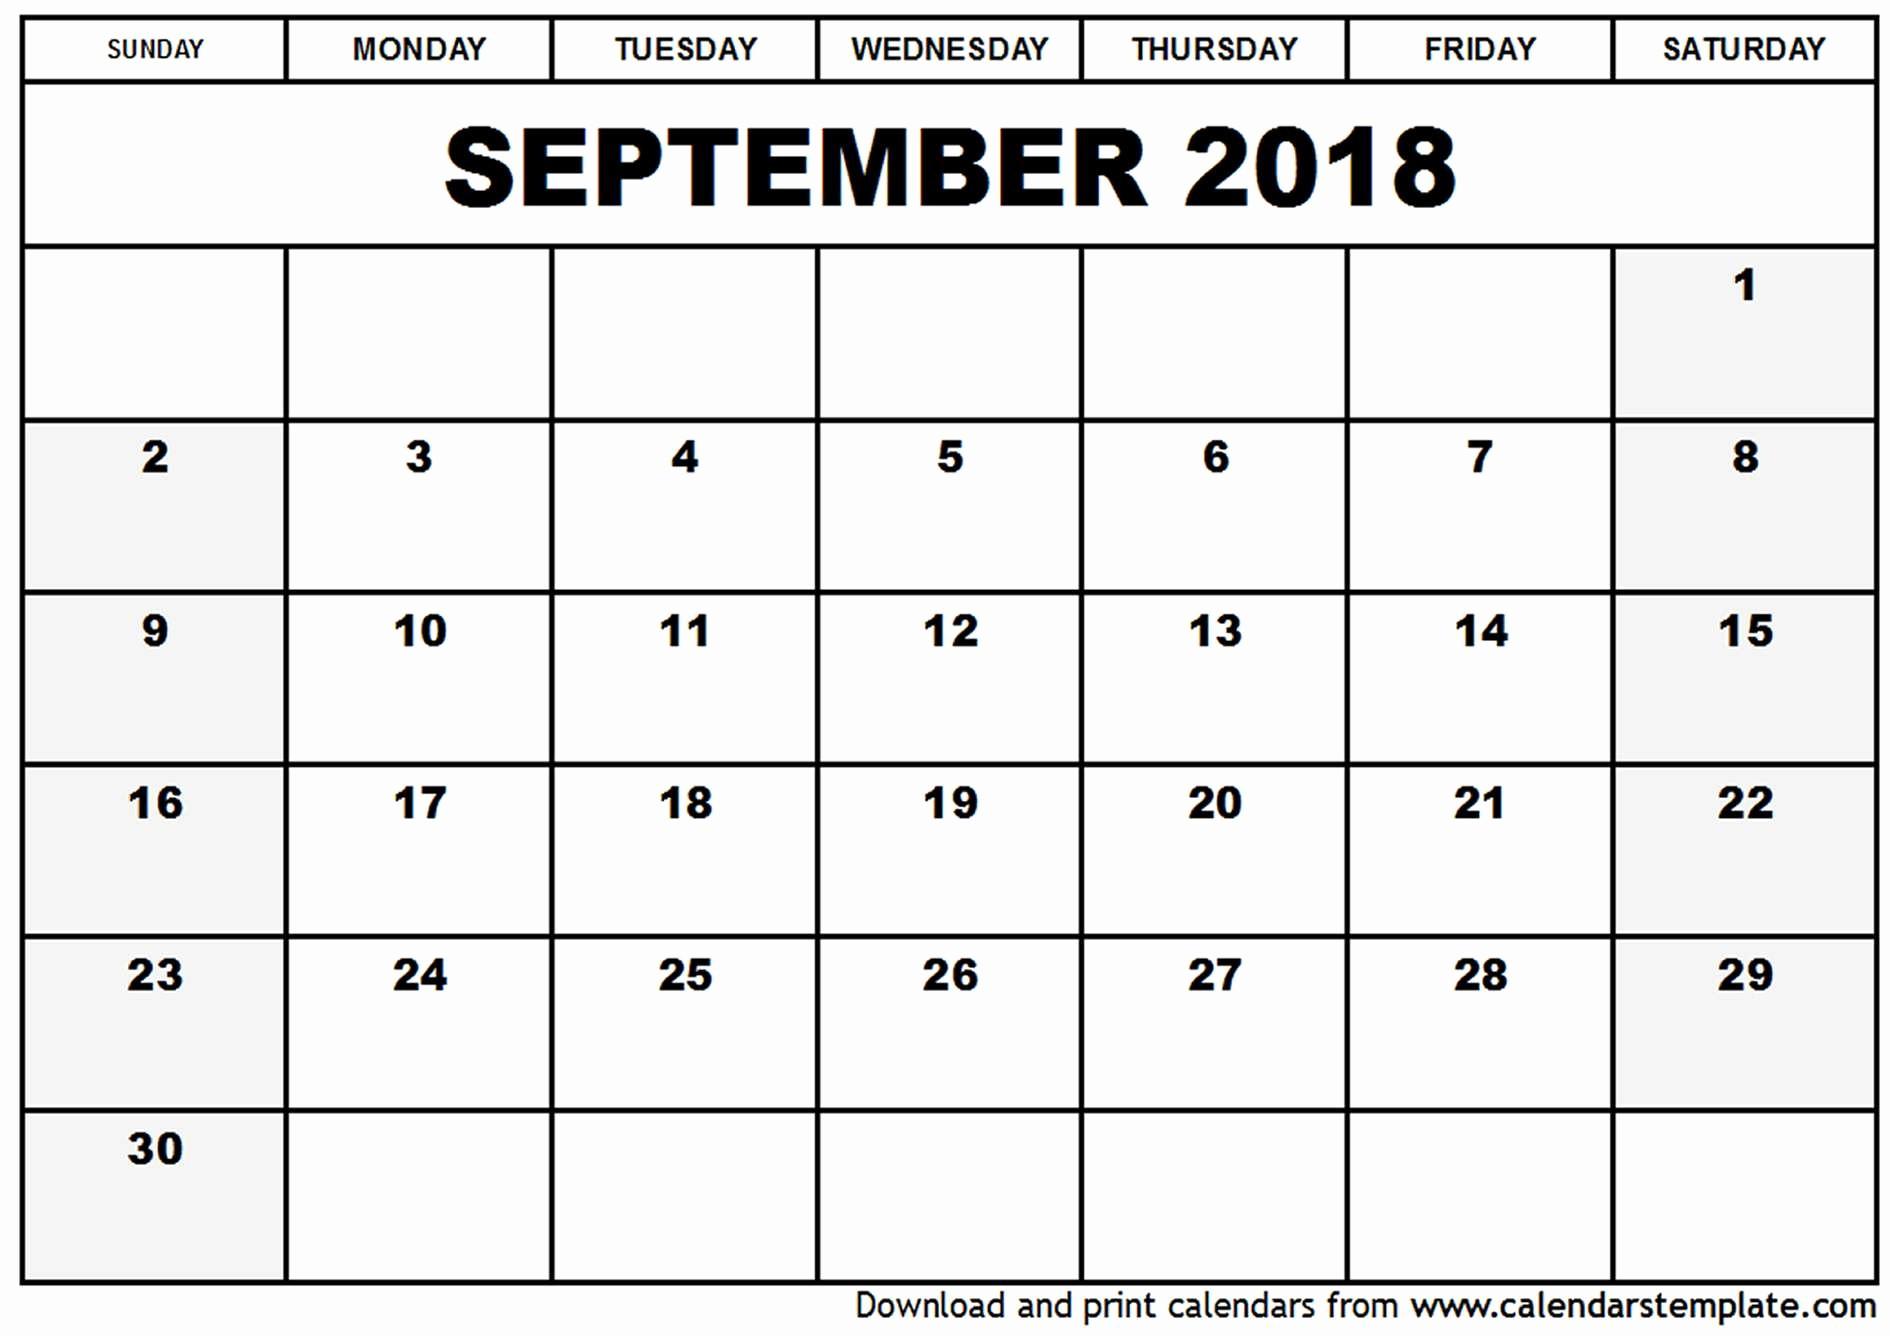 September 2017 Printable Calendar Word Unique September 2018 Calendar Word